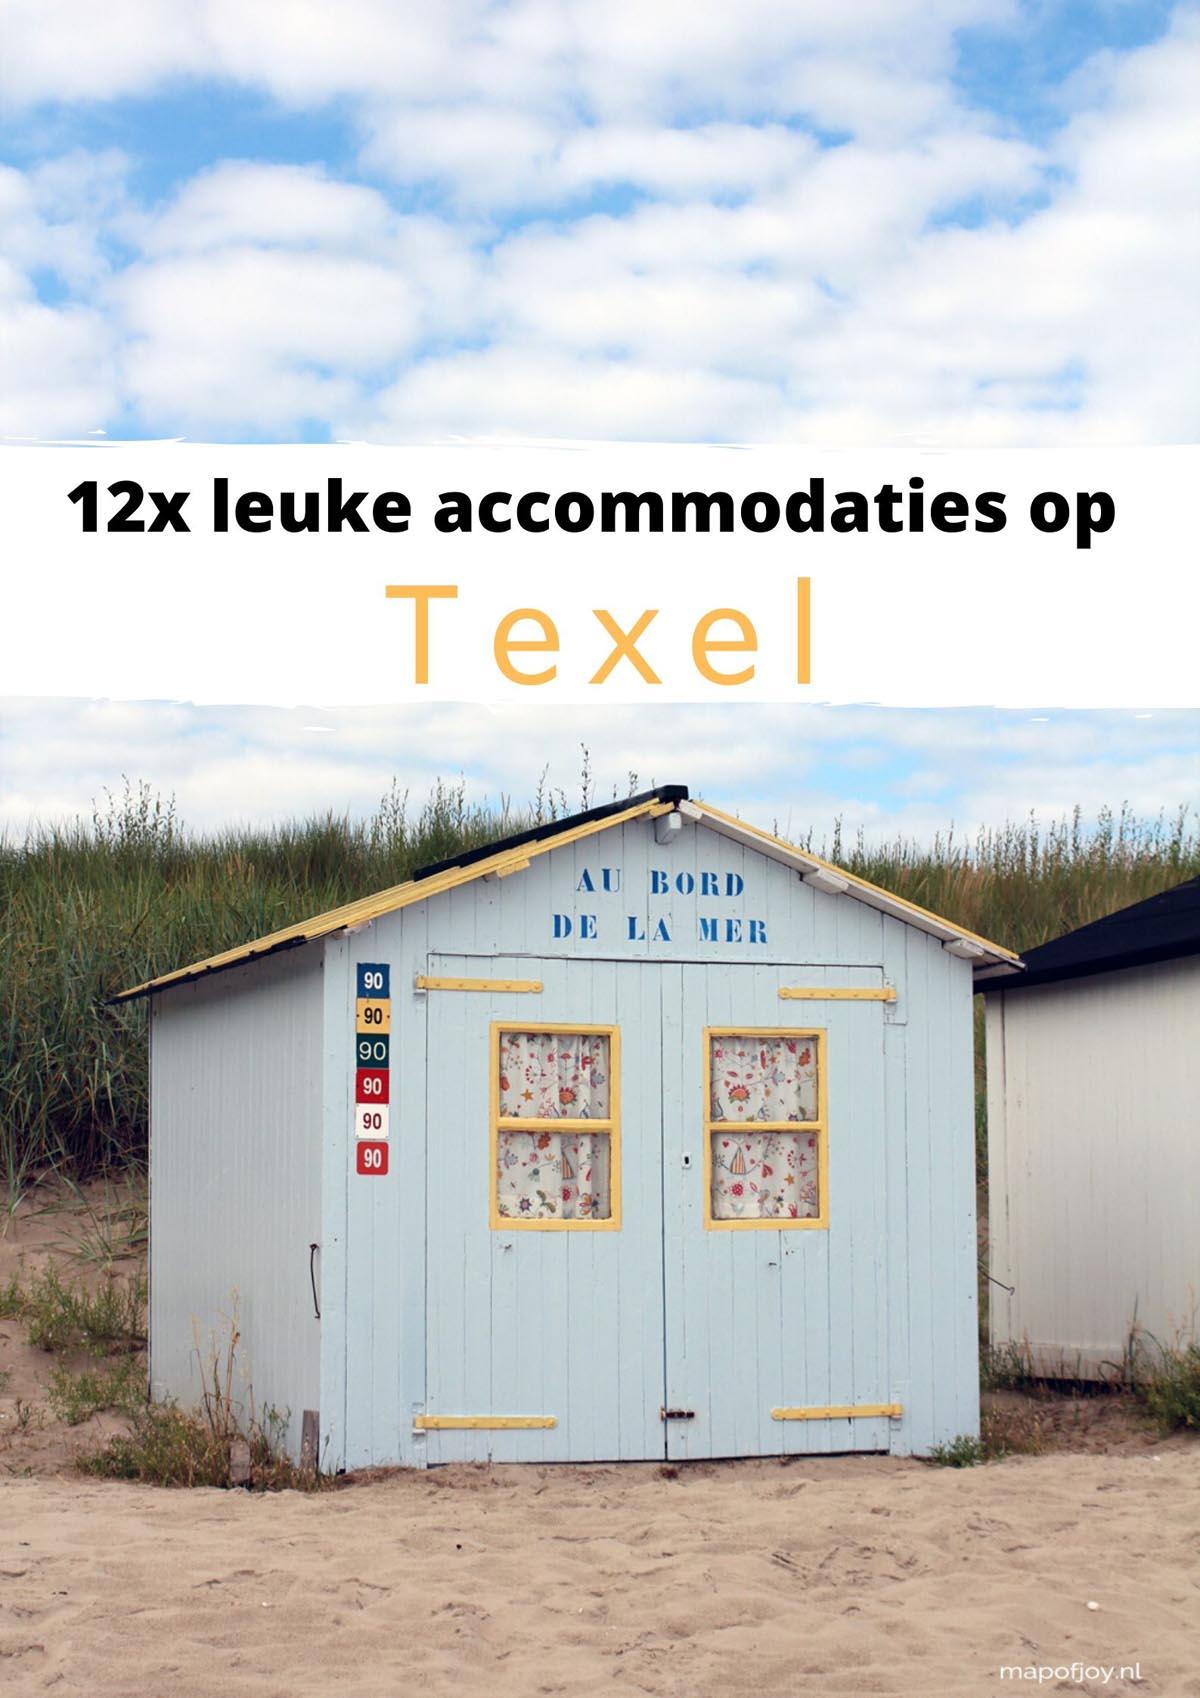 12x leuke accommodaties op Texel